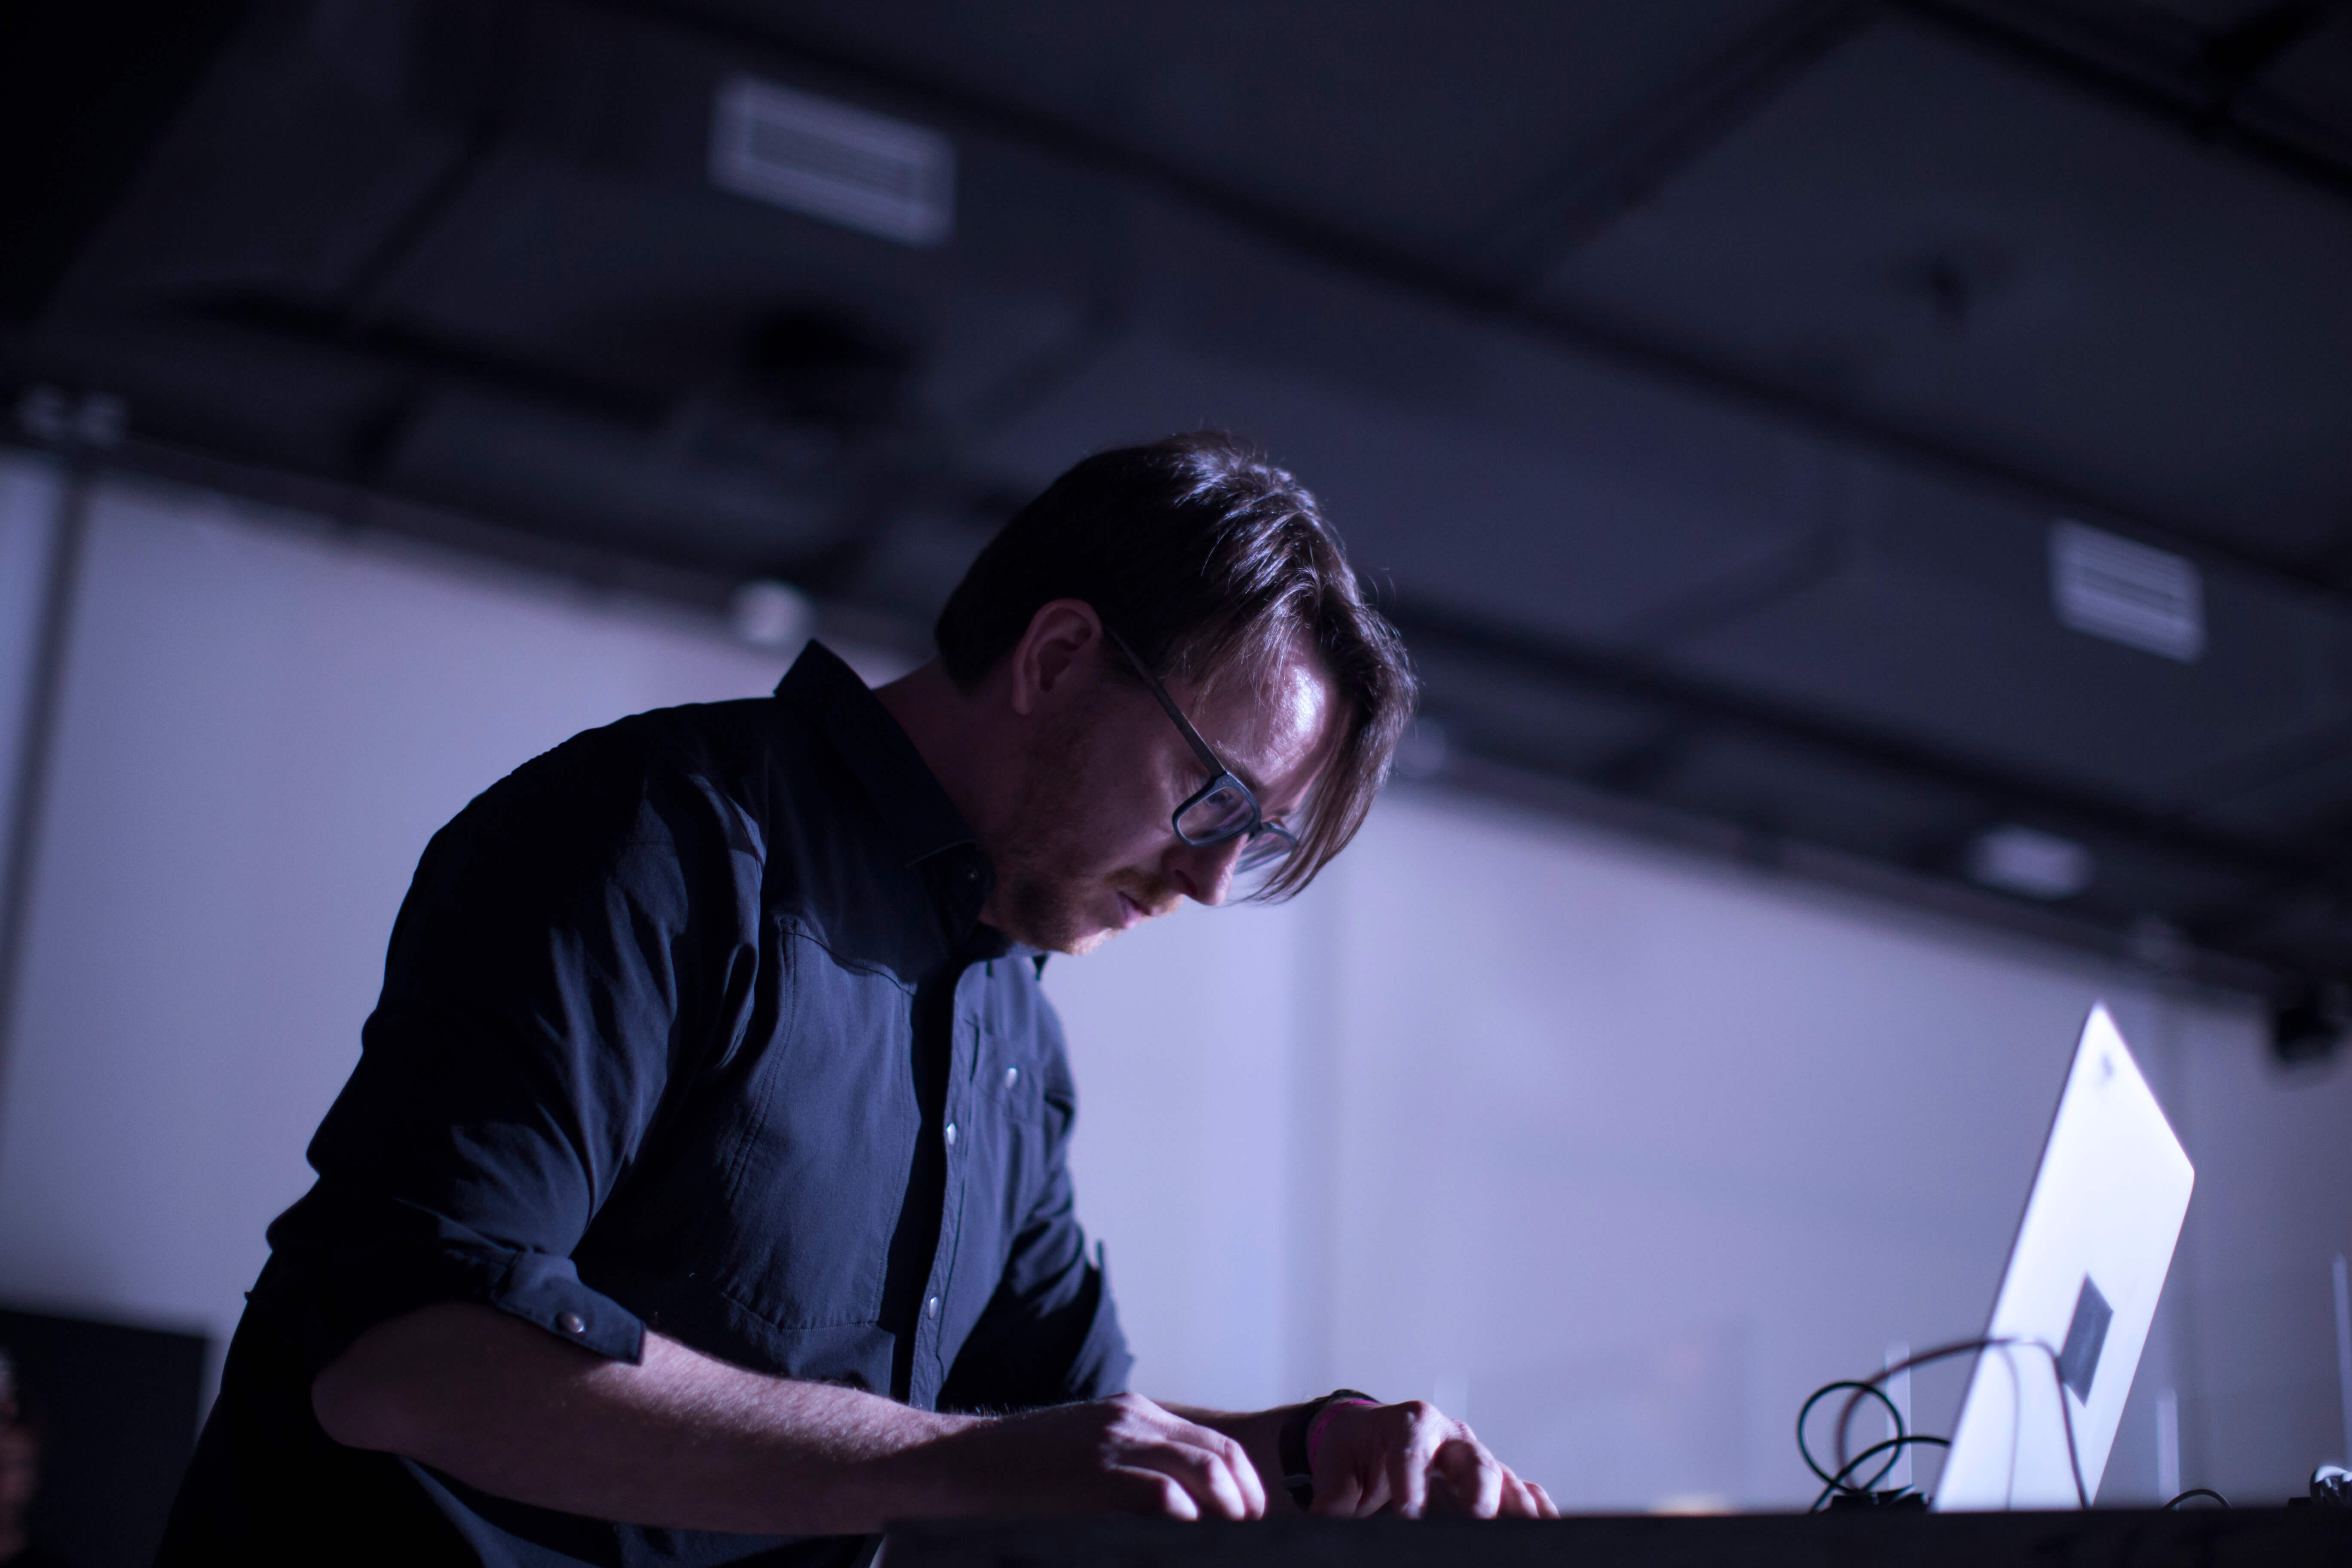 Performer of experimental music Nicolas Bernier and his laptop.